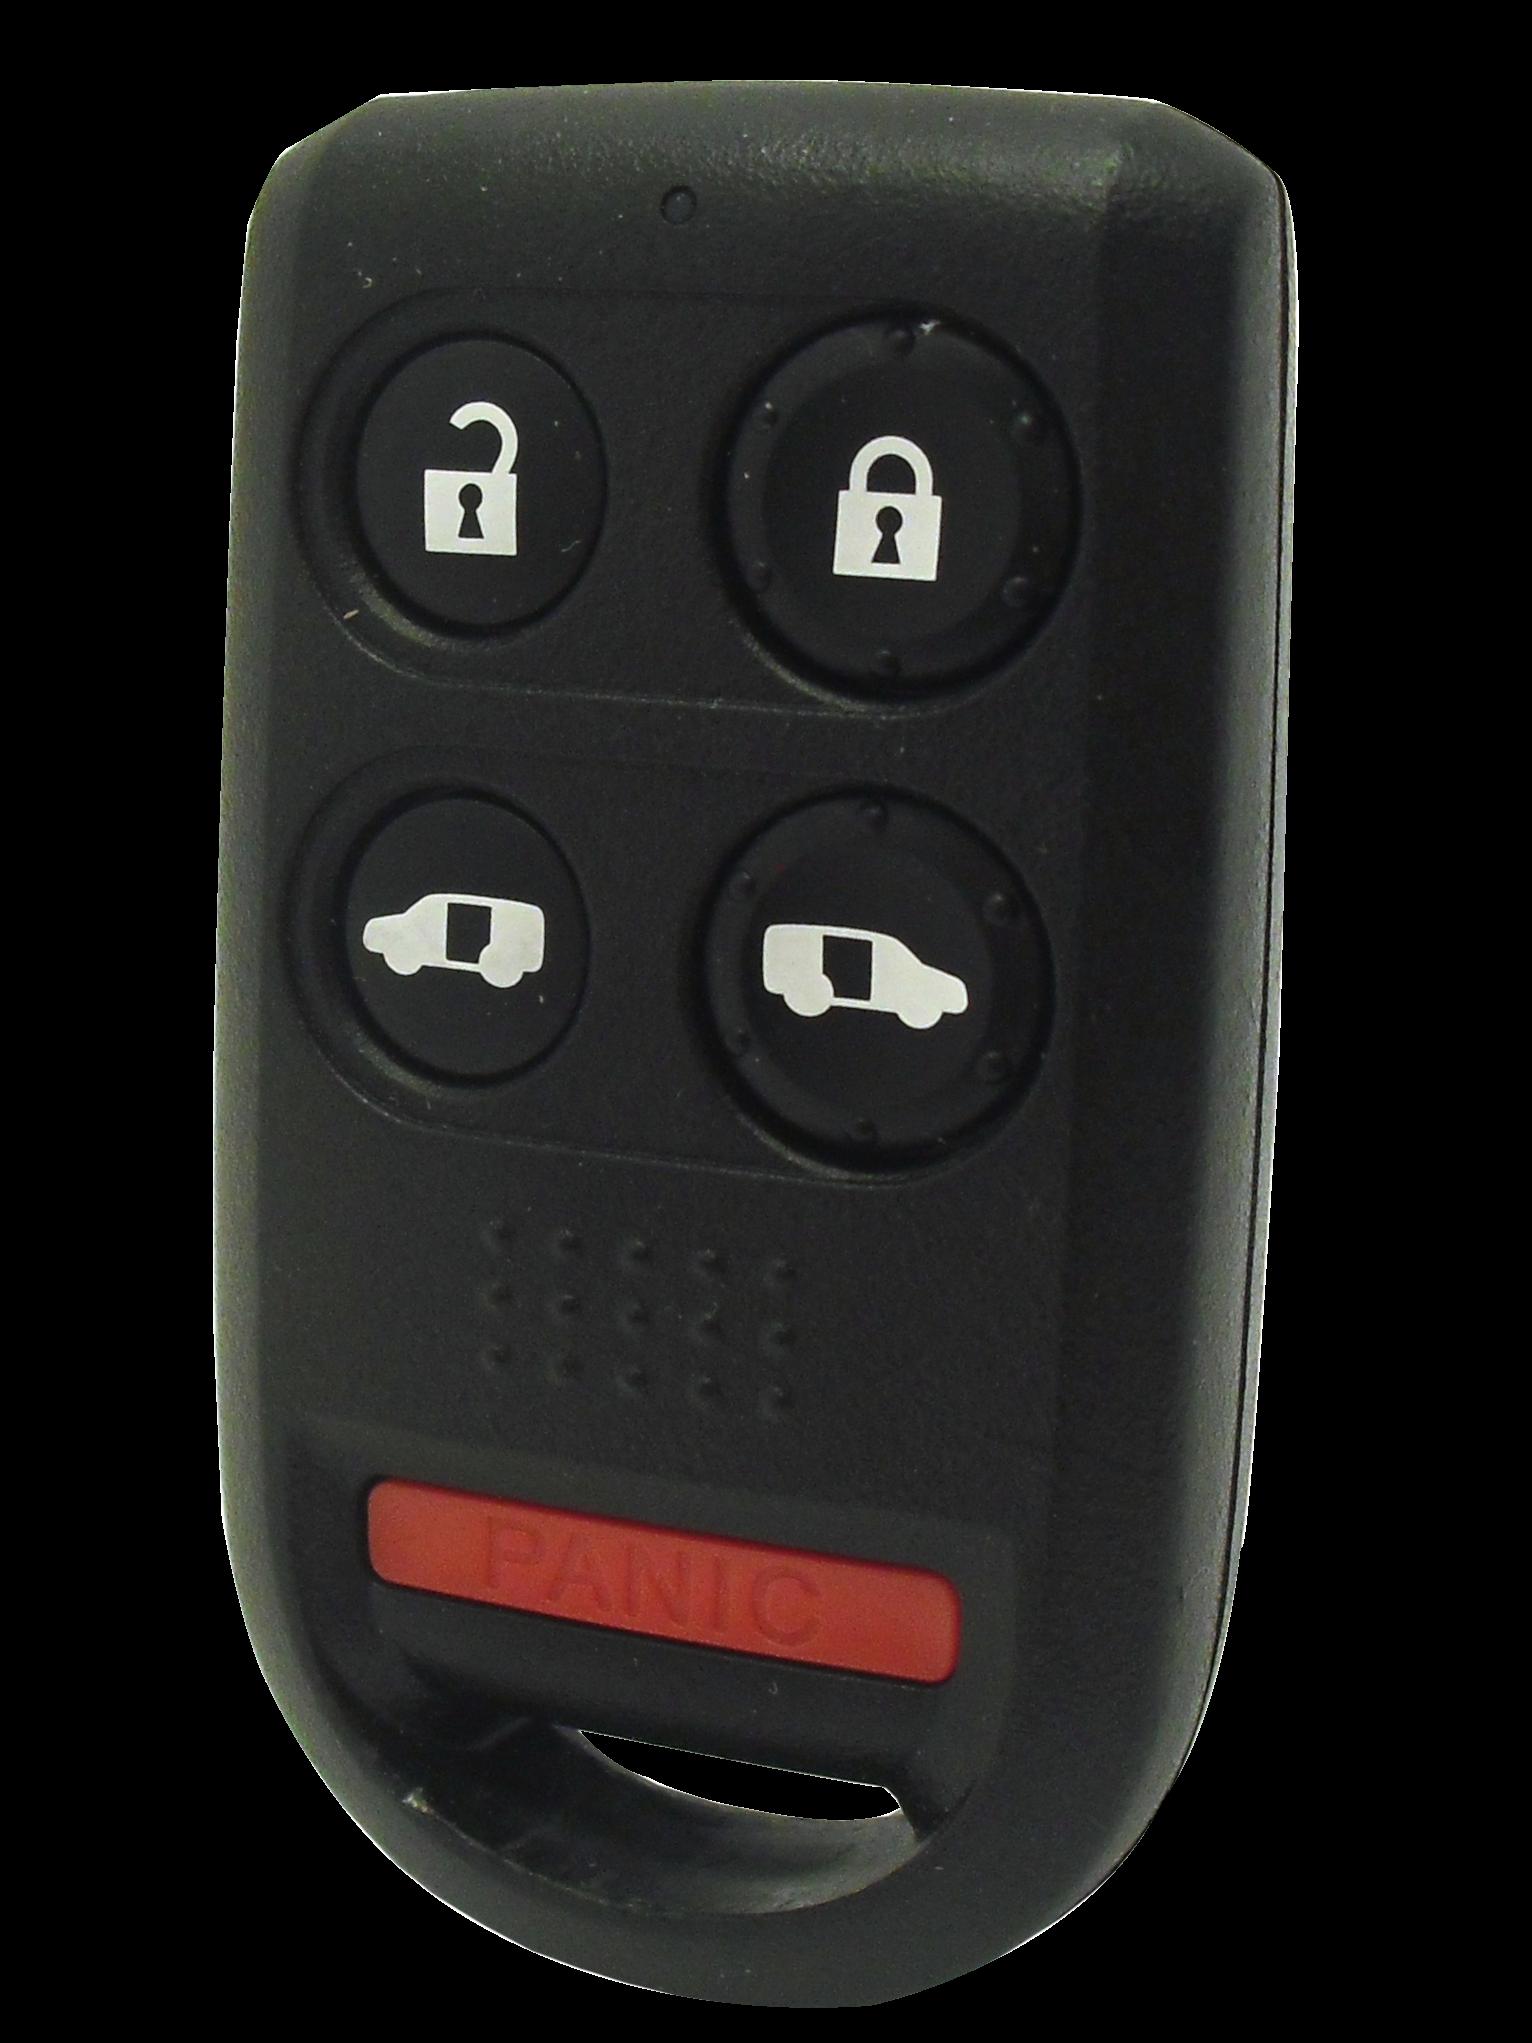 2005-2010 Honda Odyssey Keyless Entry Remote - 5 Button Models w/ Power Doors